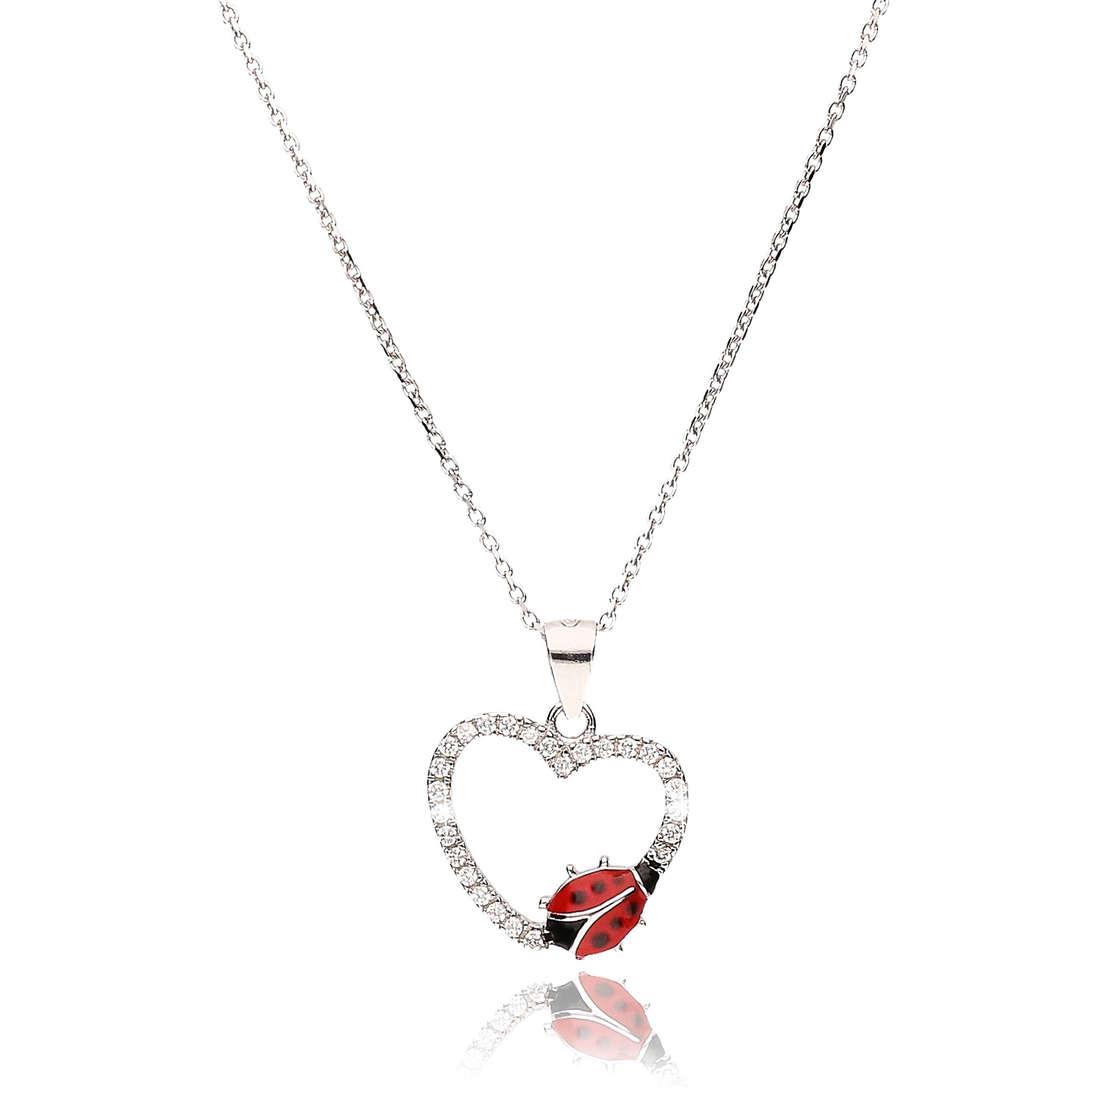 collana donna gioielli GioiaPura GPSRBS0389F-R-43